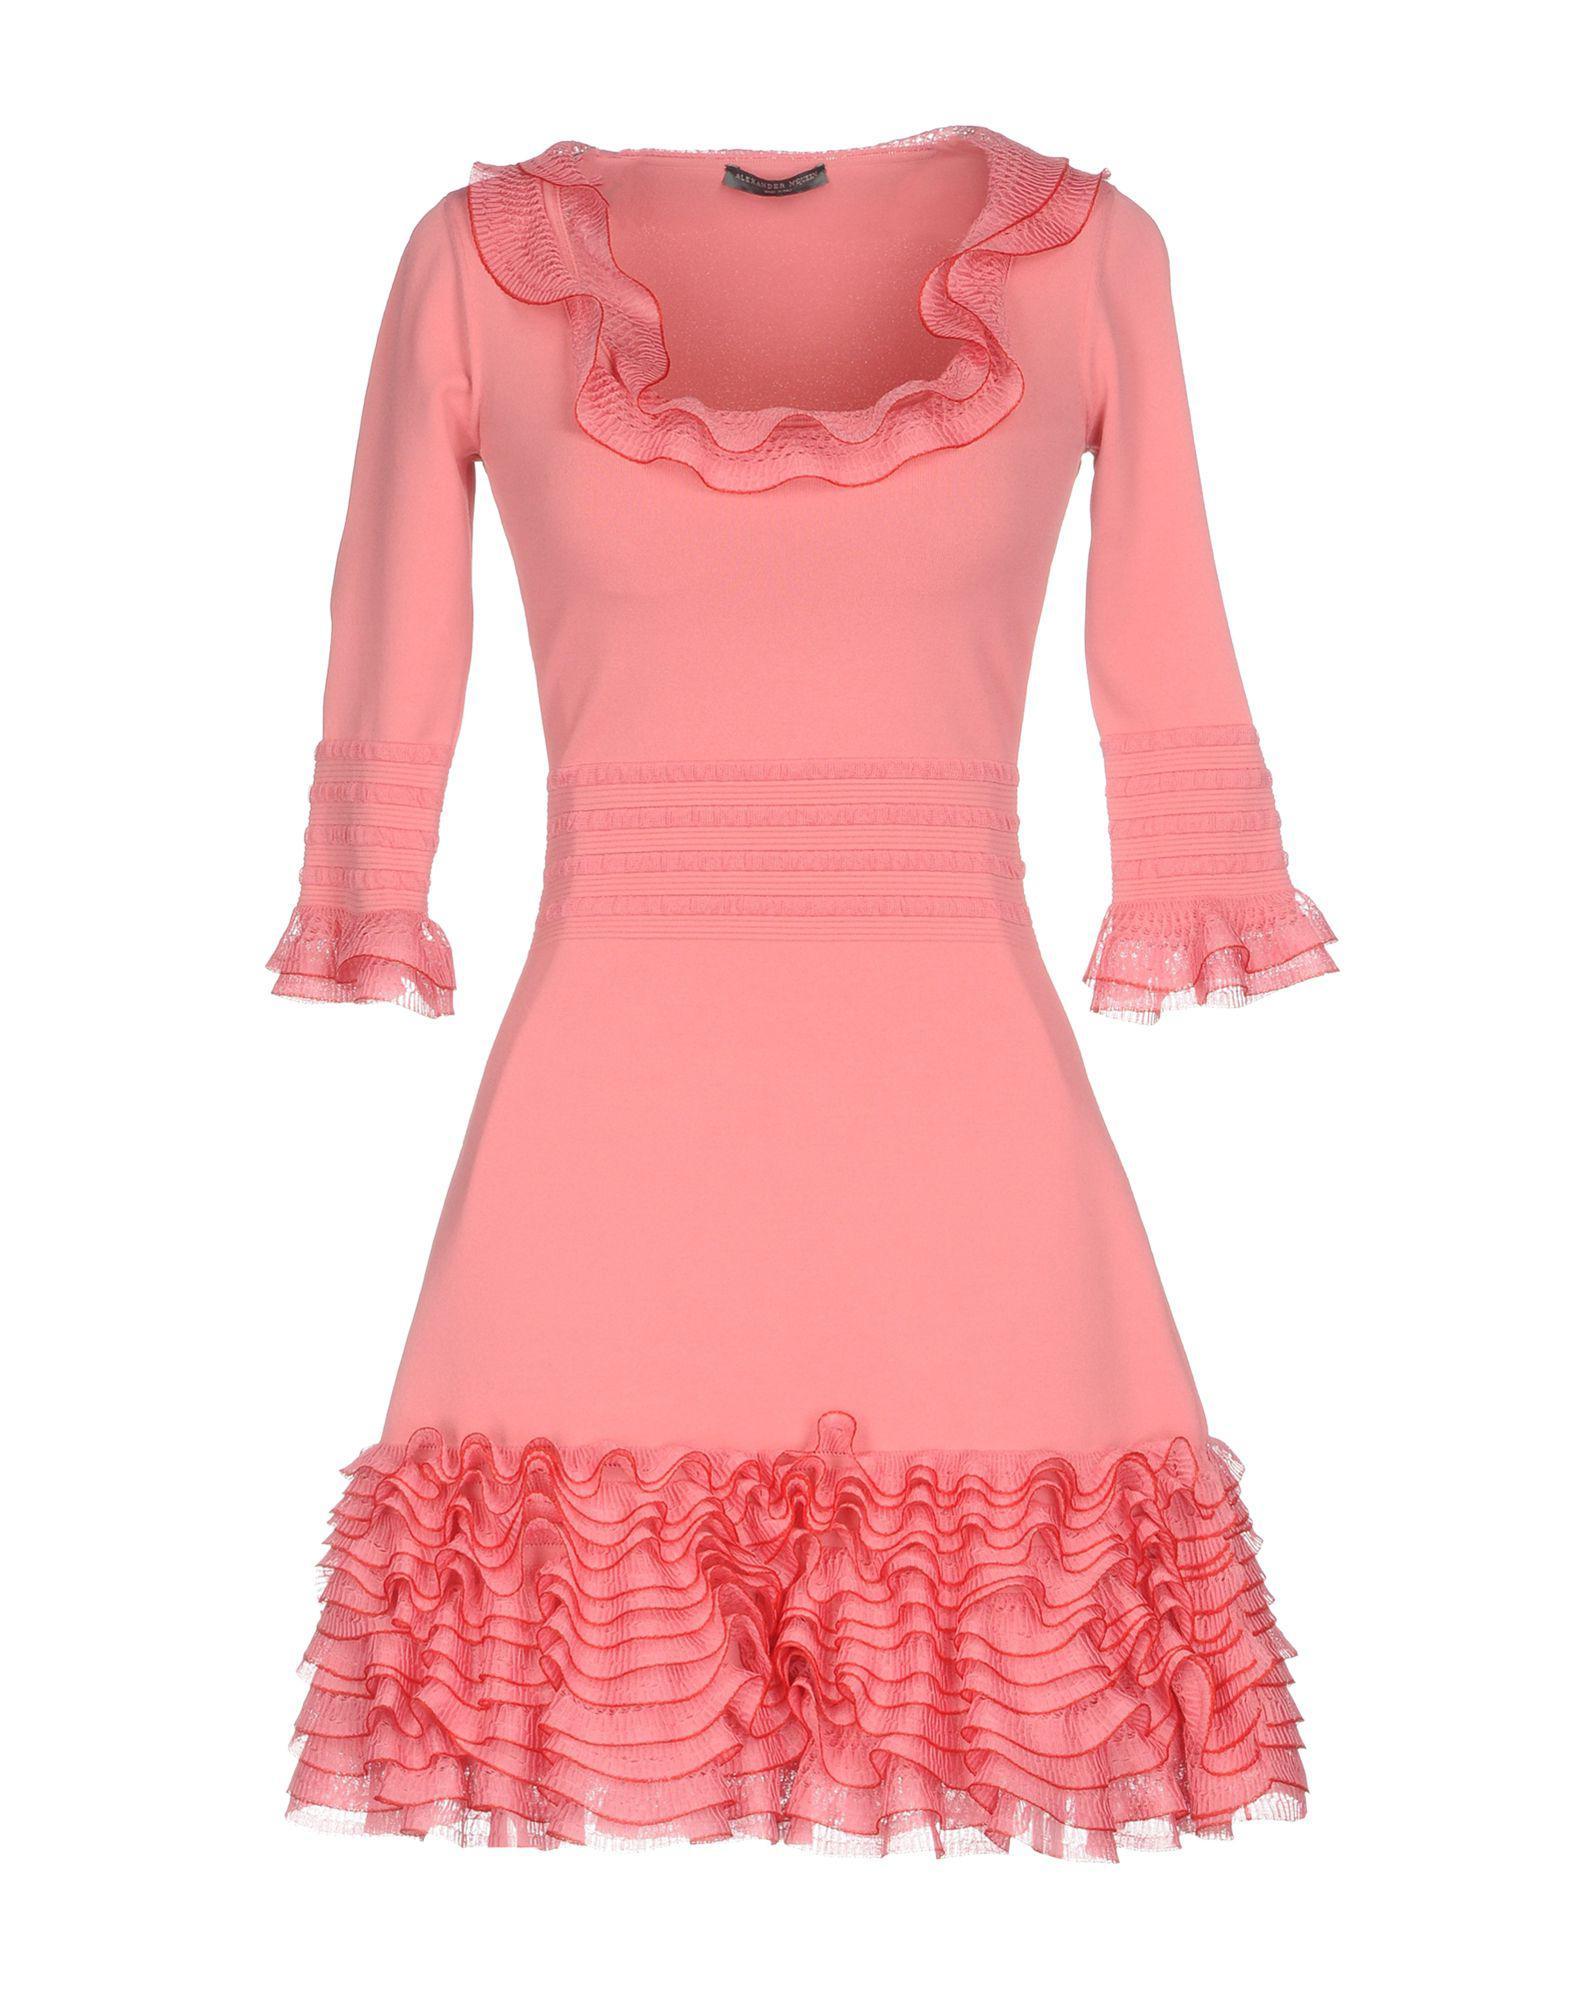 Lyst - Alexander mcqueen Short Dress in Pink